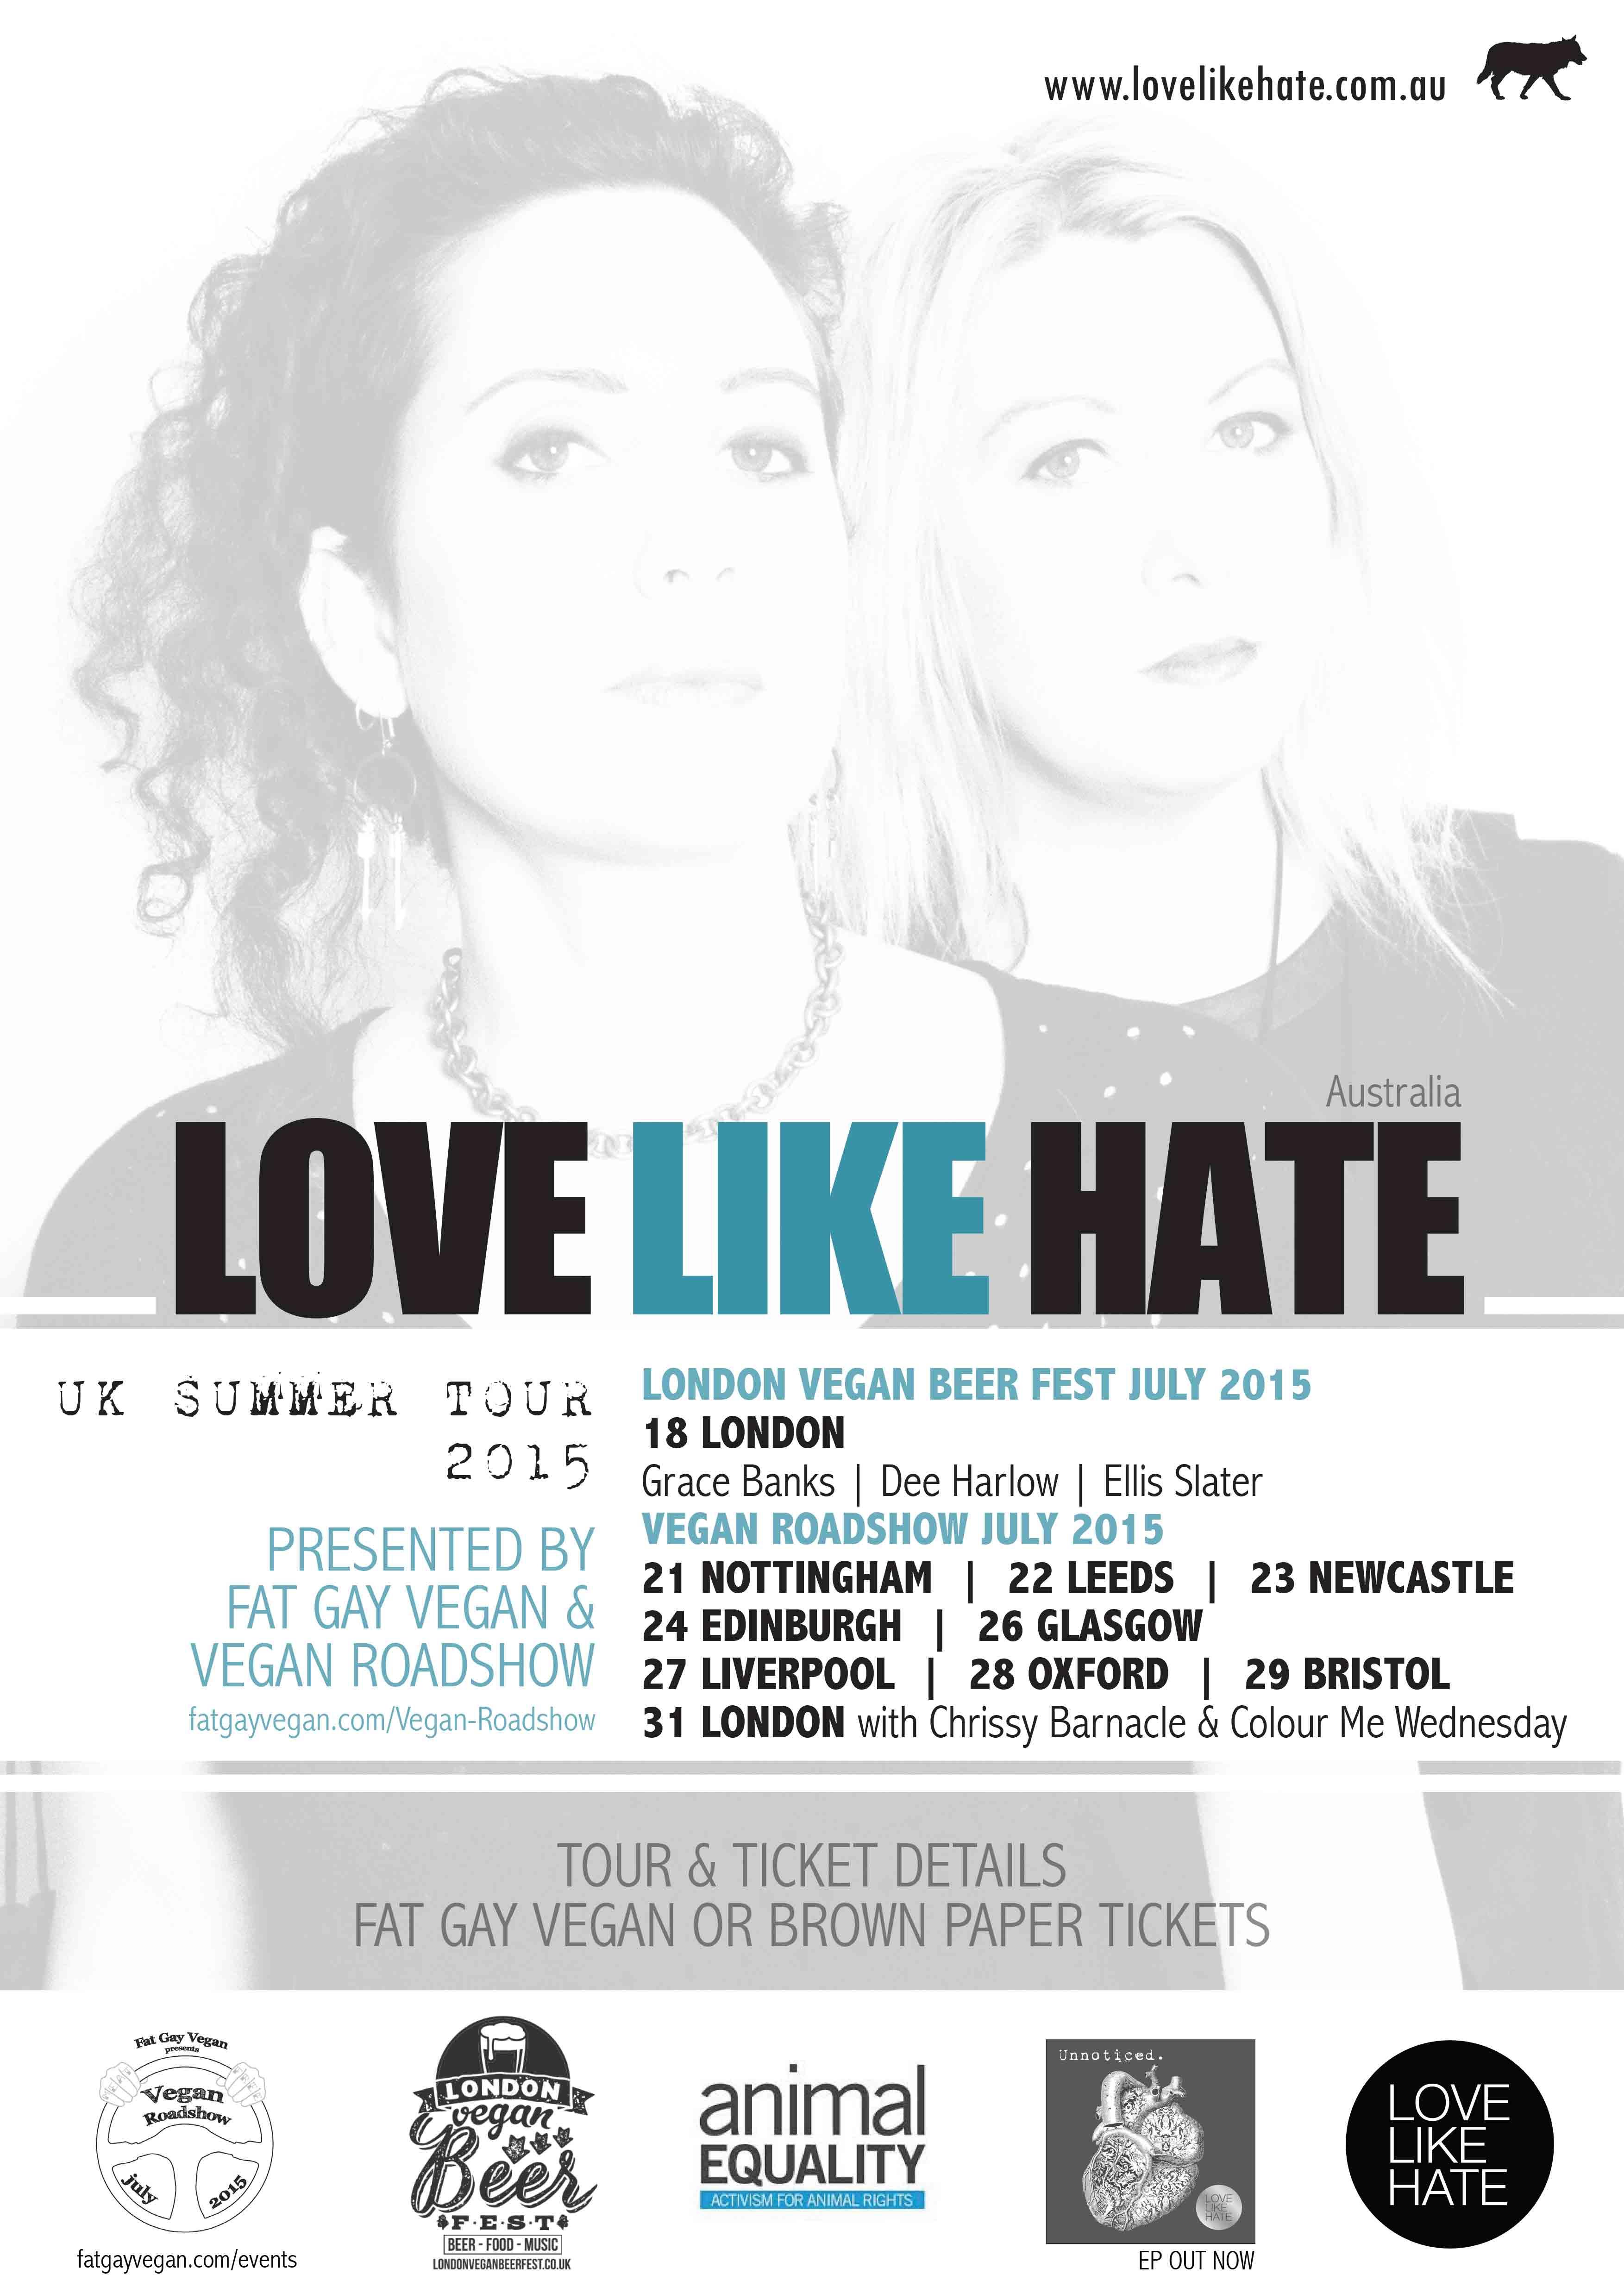 https://i0.wp.com/fatgayvegan.com/wp-content/uploads/2015/04/LoveLikeHate-2015-Tour-UK-2.jpg?fit=%2C